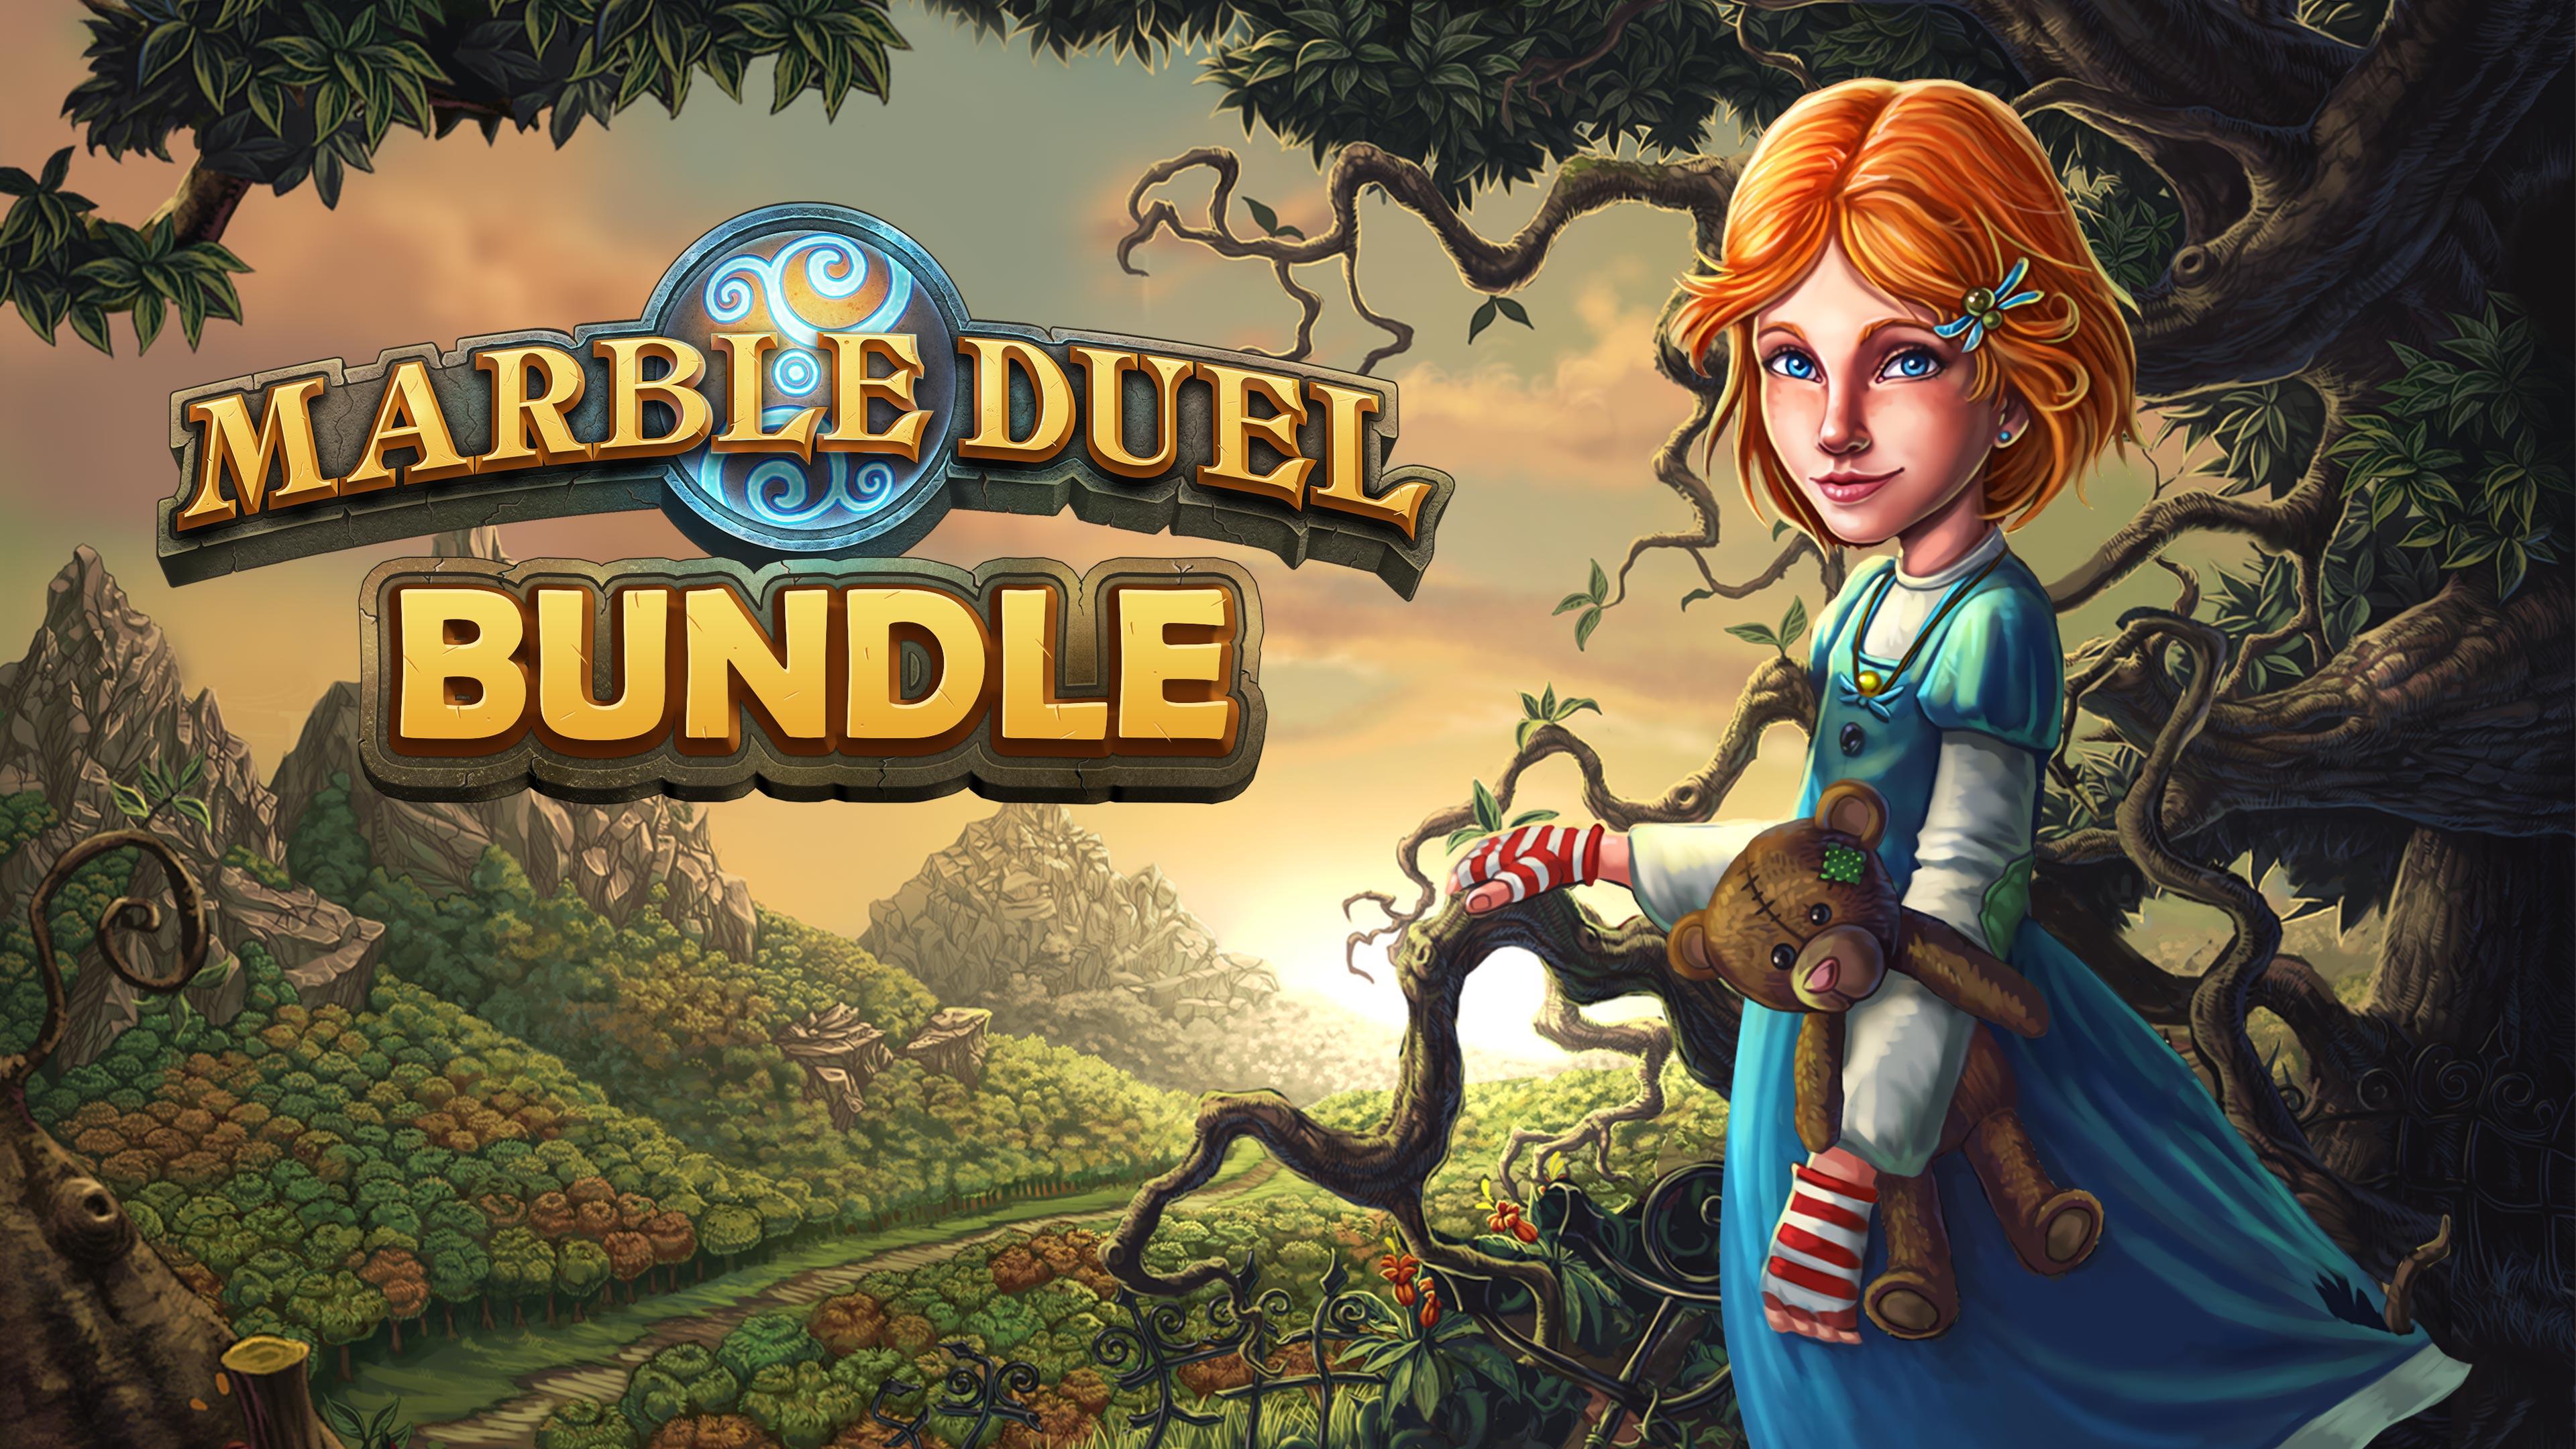 Marble Duel Bundle